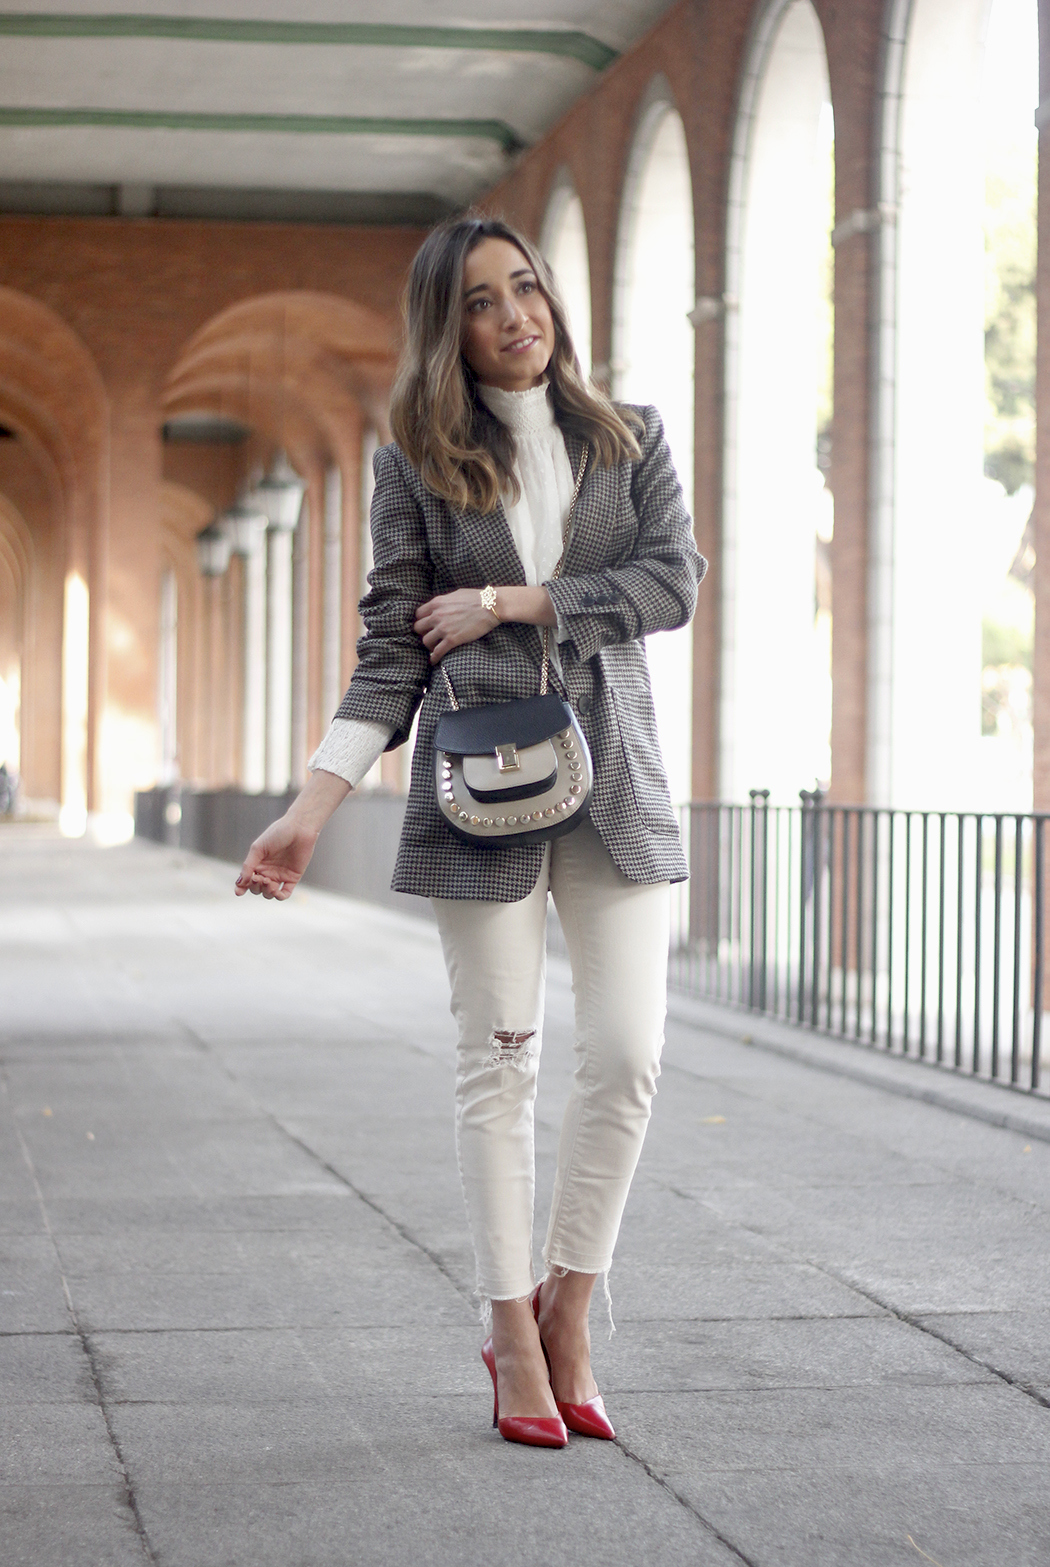 Plumeti blouse houndstooth blazer white jeans outfit style streetstyle26